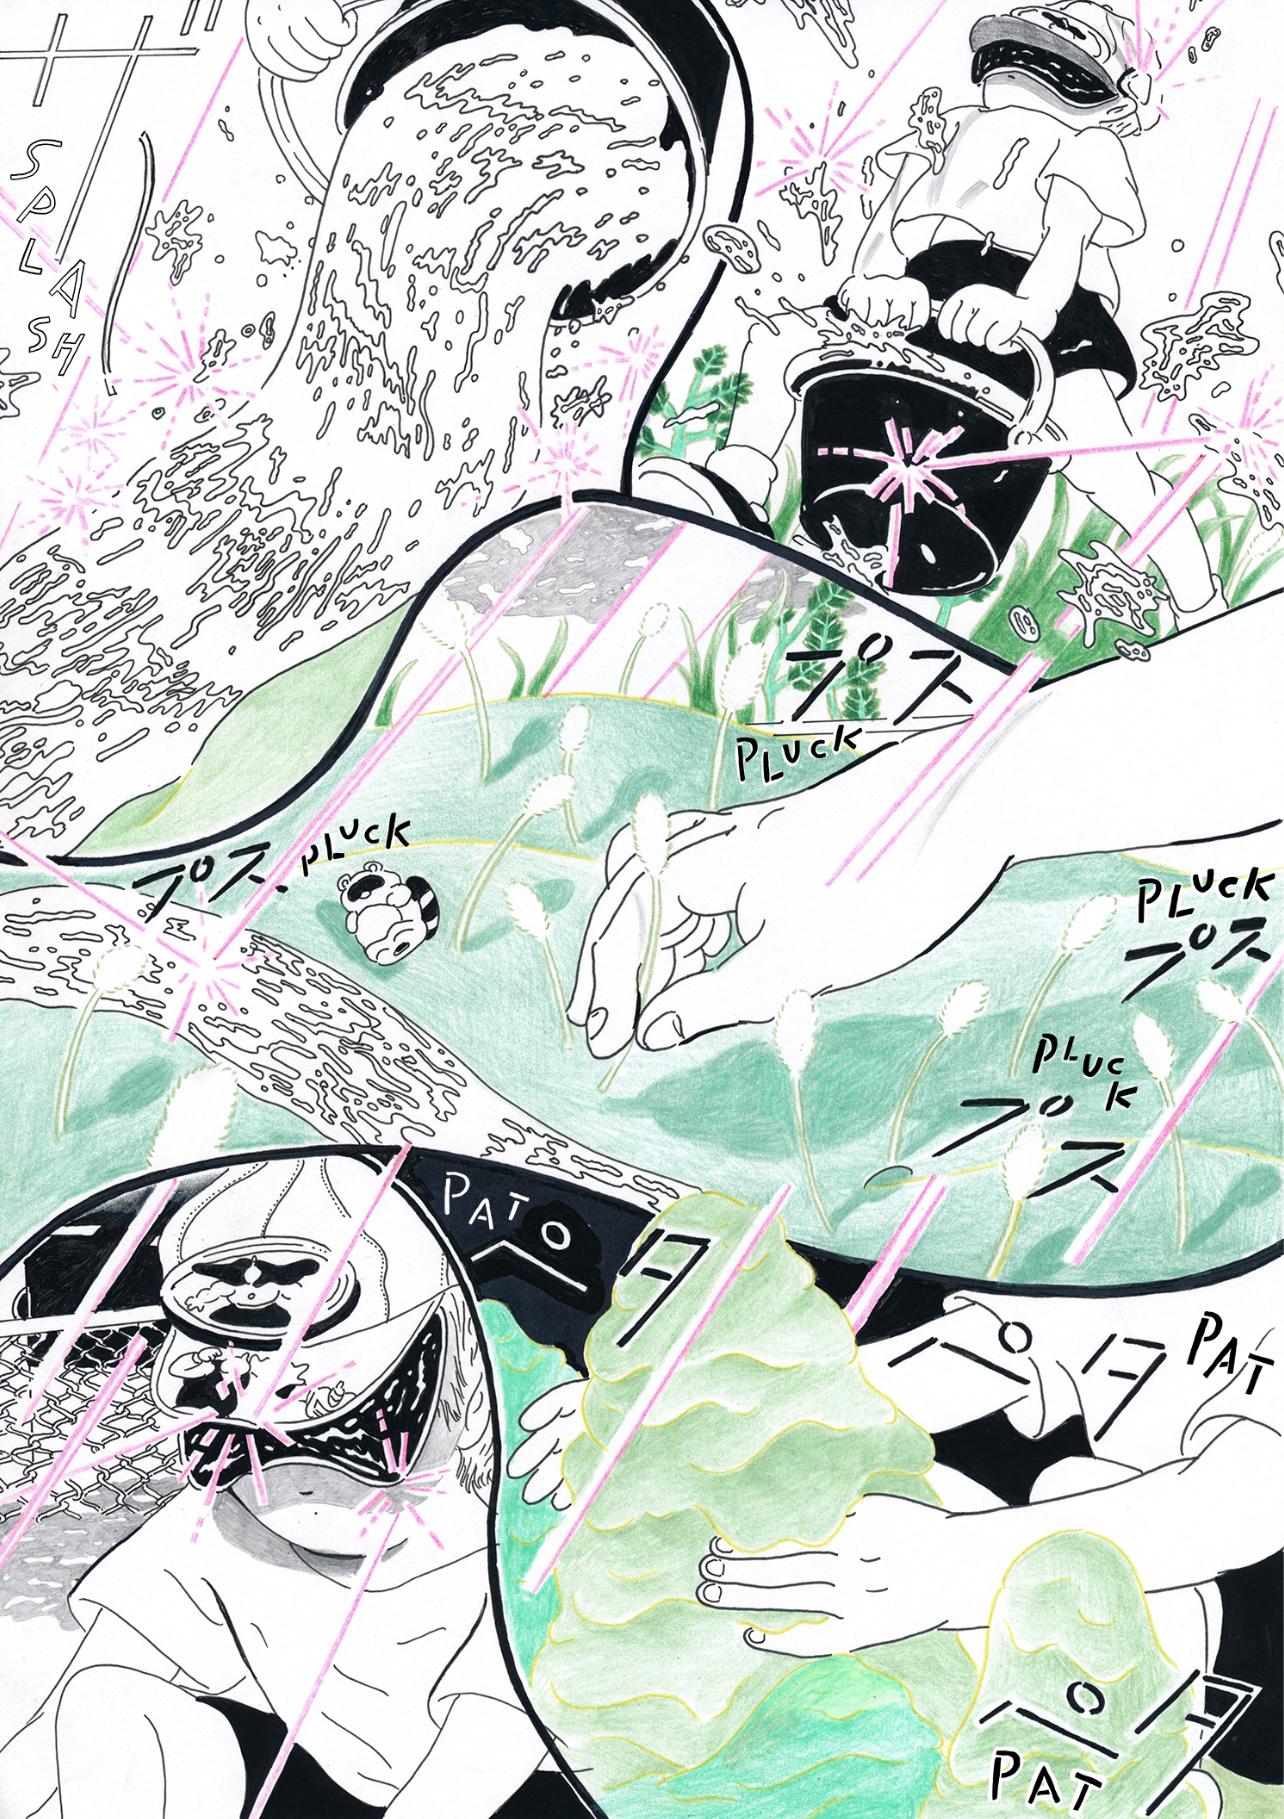 From <em>En Chan's House</em>, a literary manga by Ayumu Arisaka.